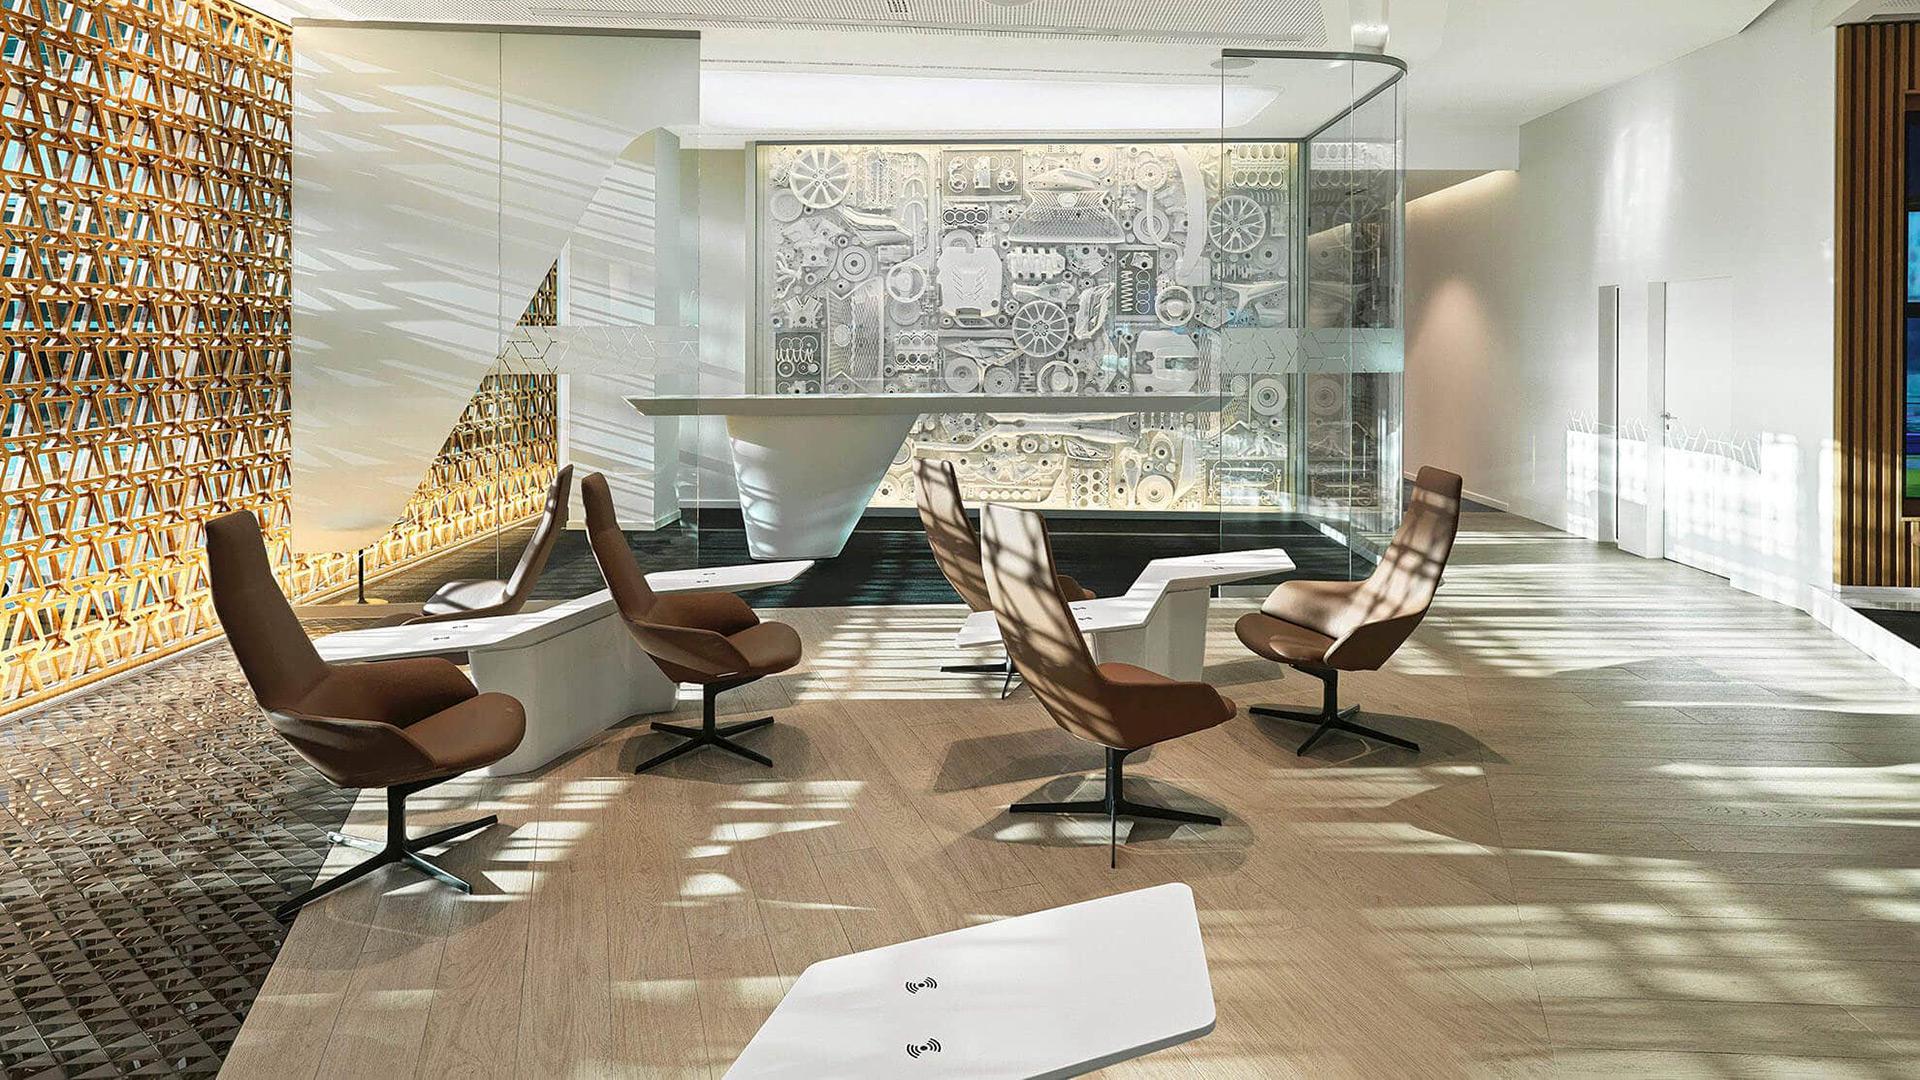 2019 015 Lexus Lounge Brussel beste van Europa